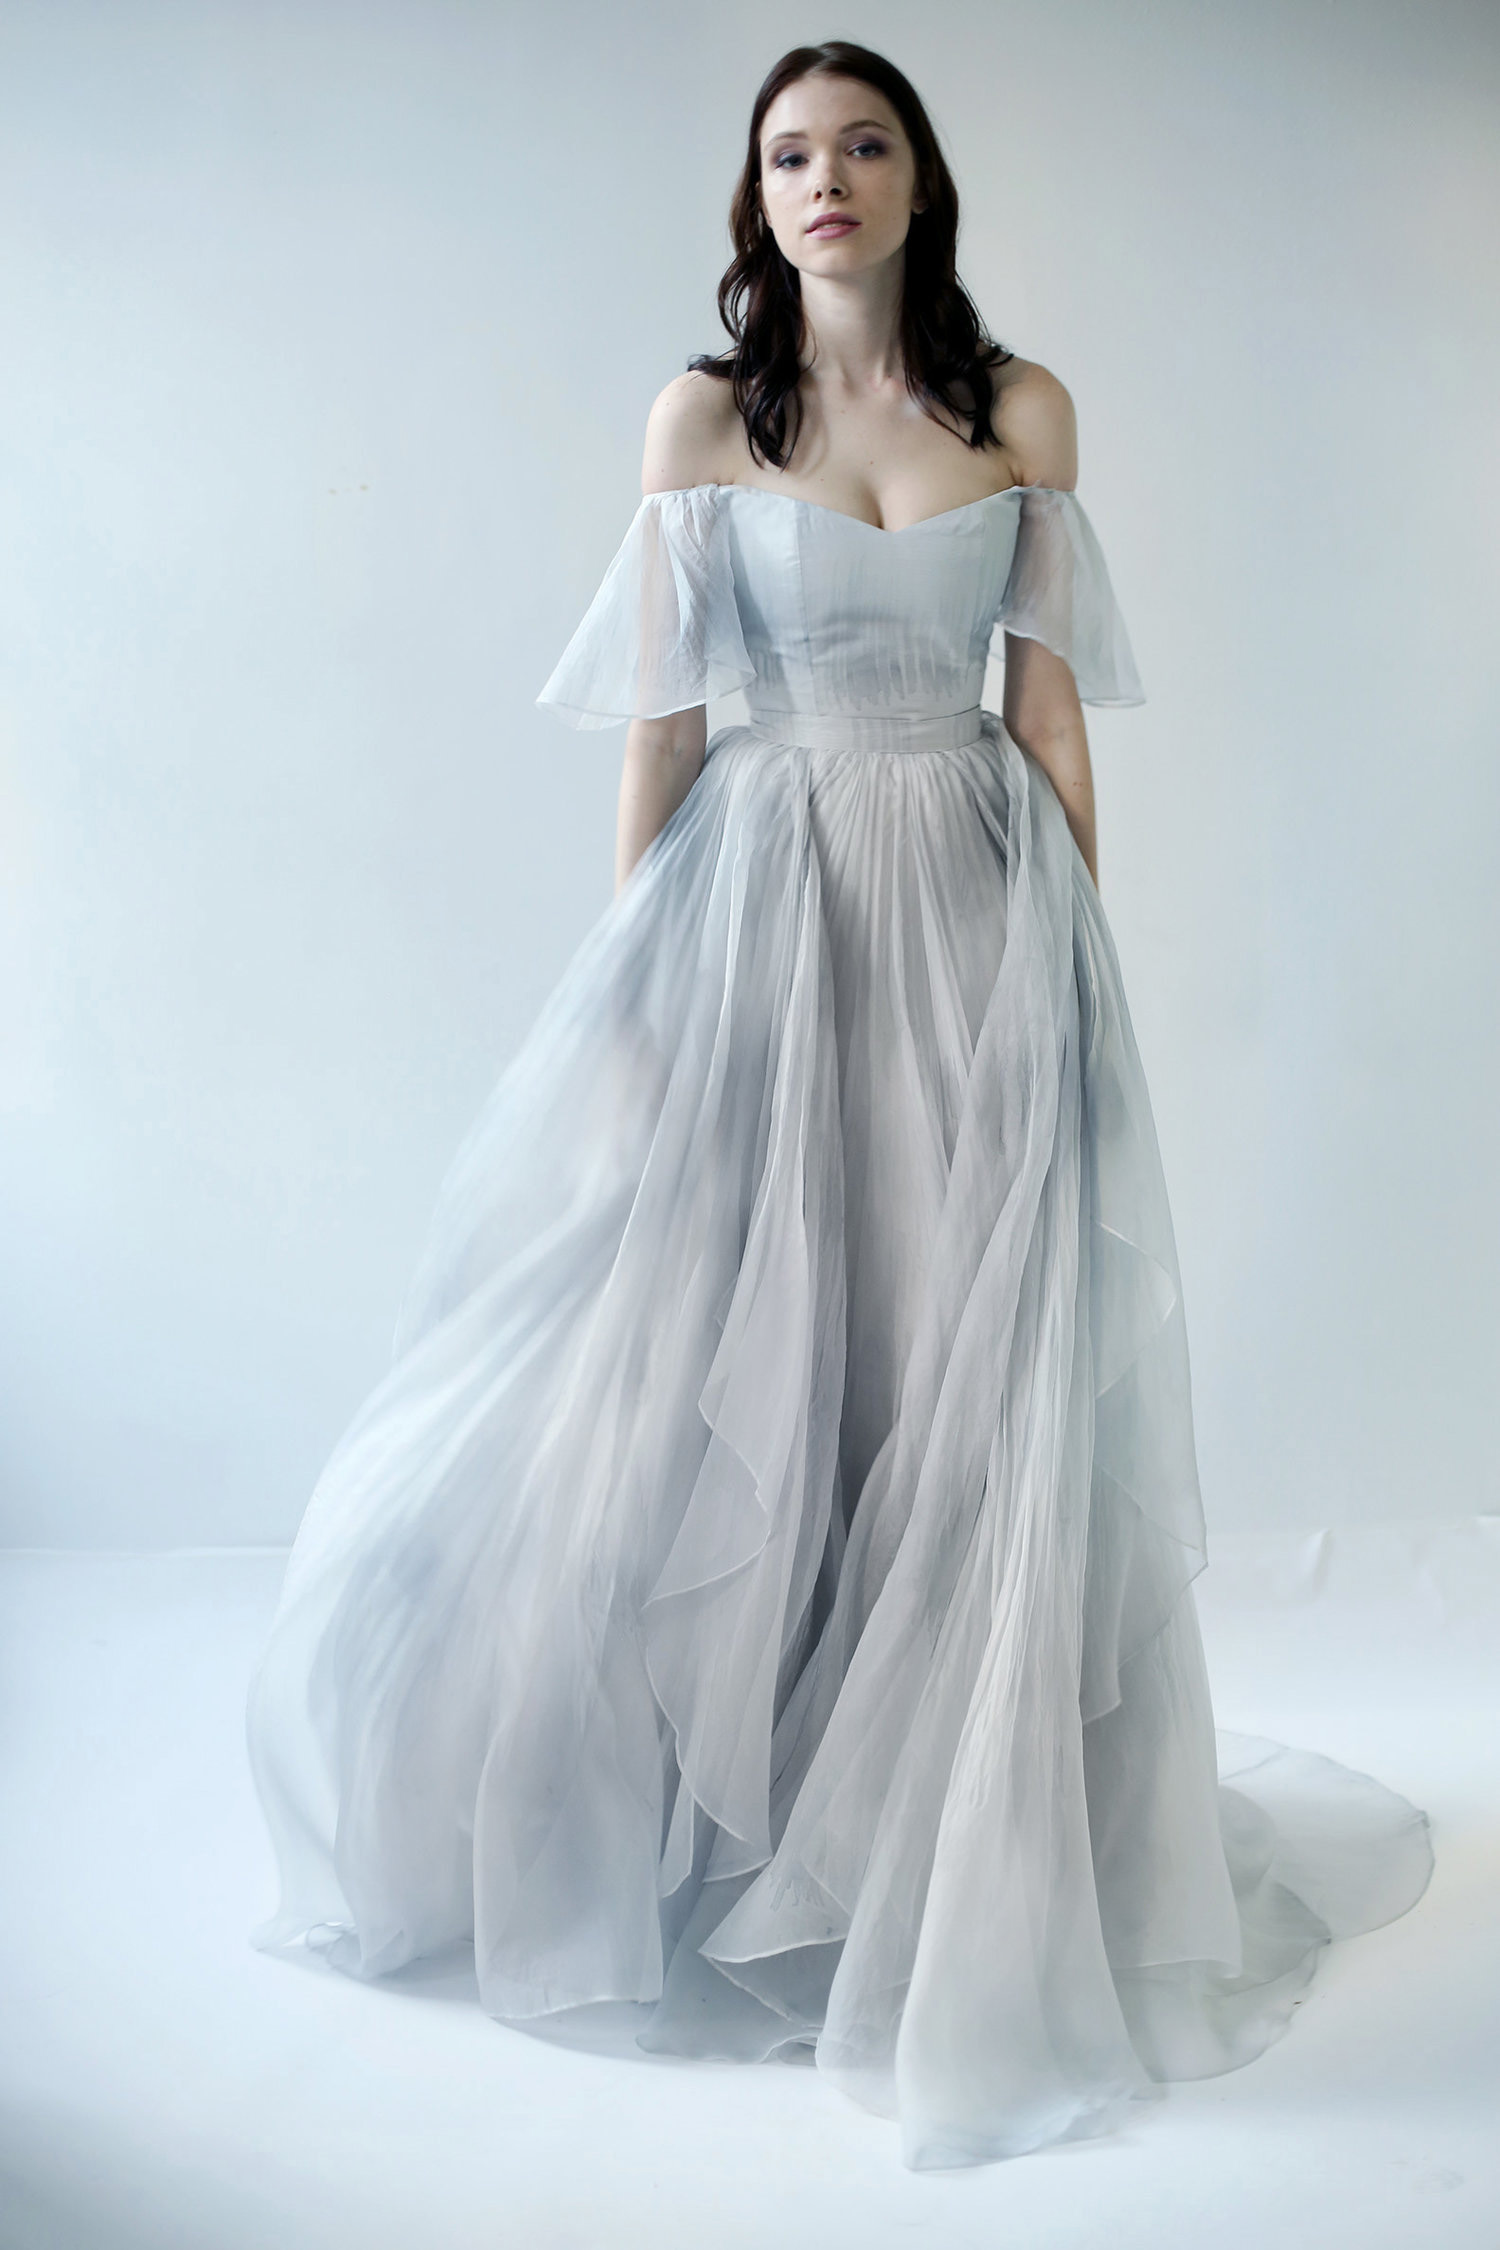 Dorable Vestida De Novia Frieze - All Wedding Dresses ...